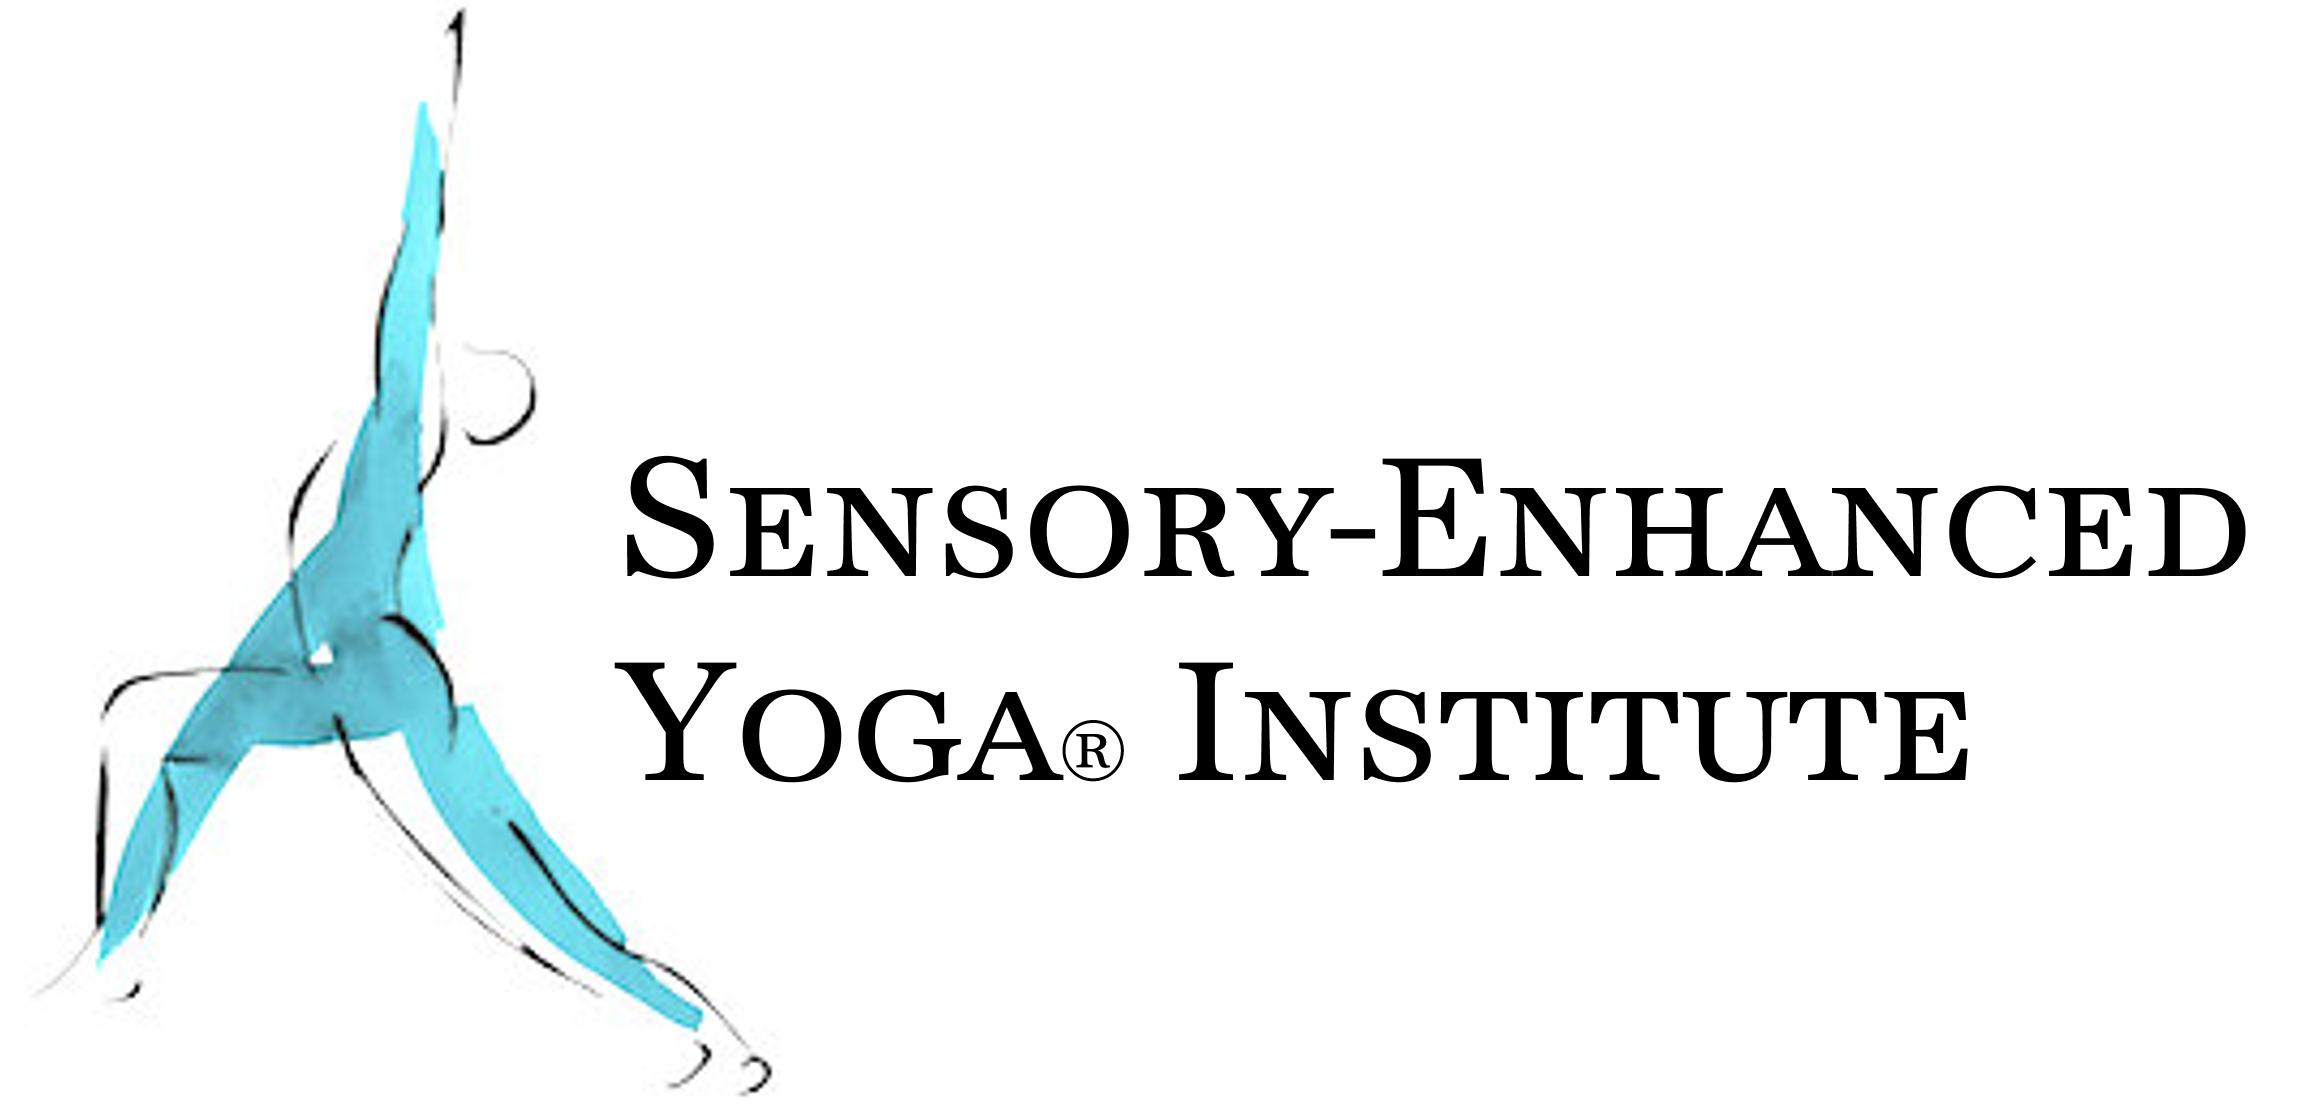 Sensory Enhanced Yoga Institute